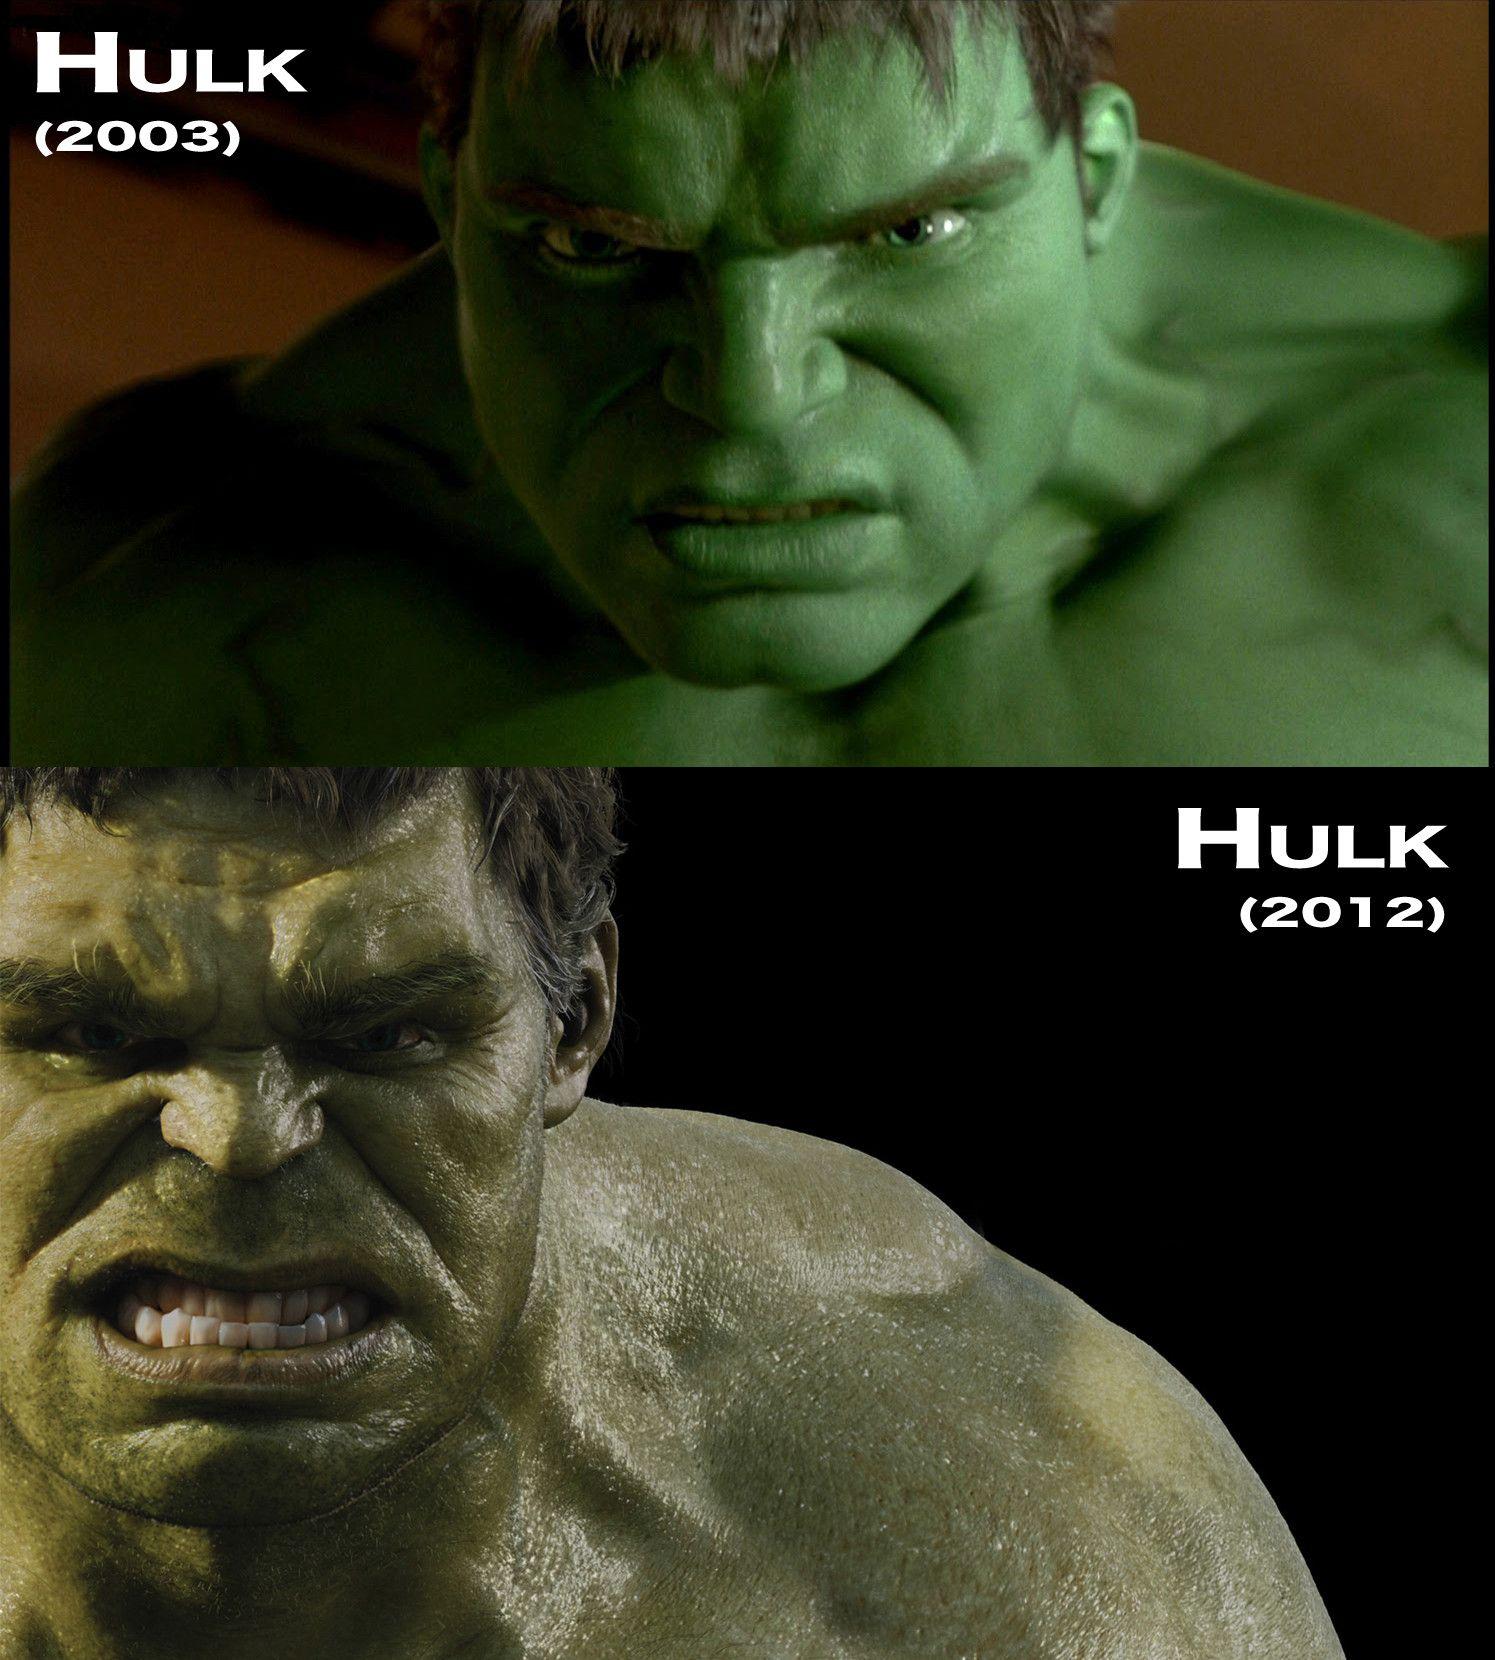 Hulk Quotes Hulk Vs Loki Best Scene Ever Description From Pinteresti